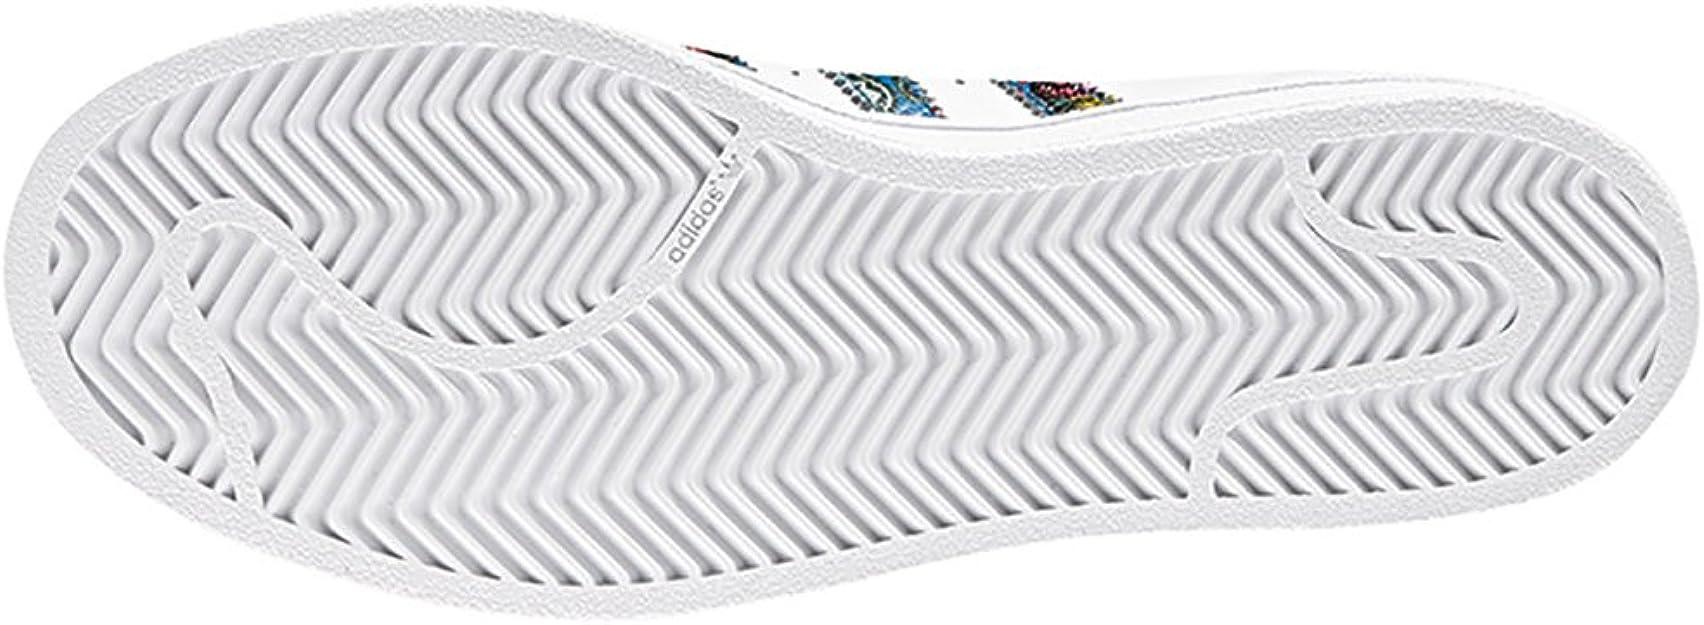 adidas Superstar, Sneakers Basses Femme, Multicolore Ftwbla